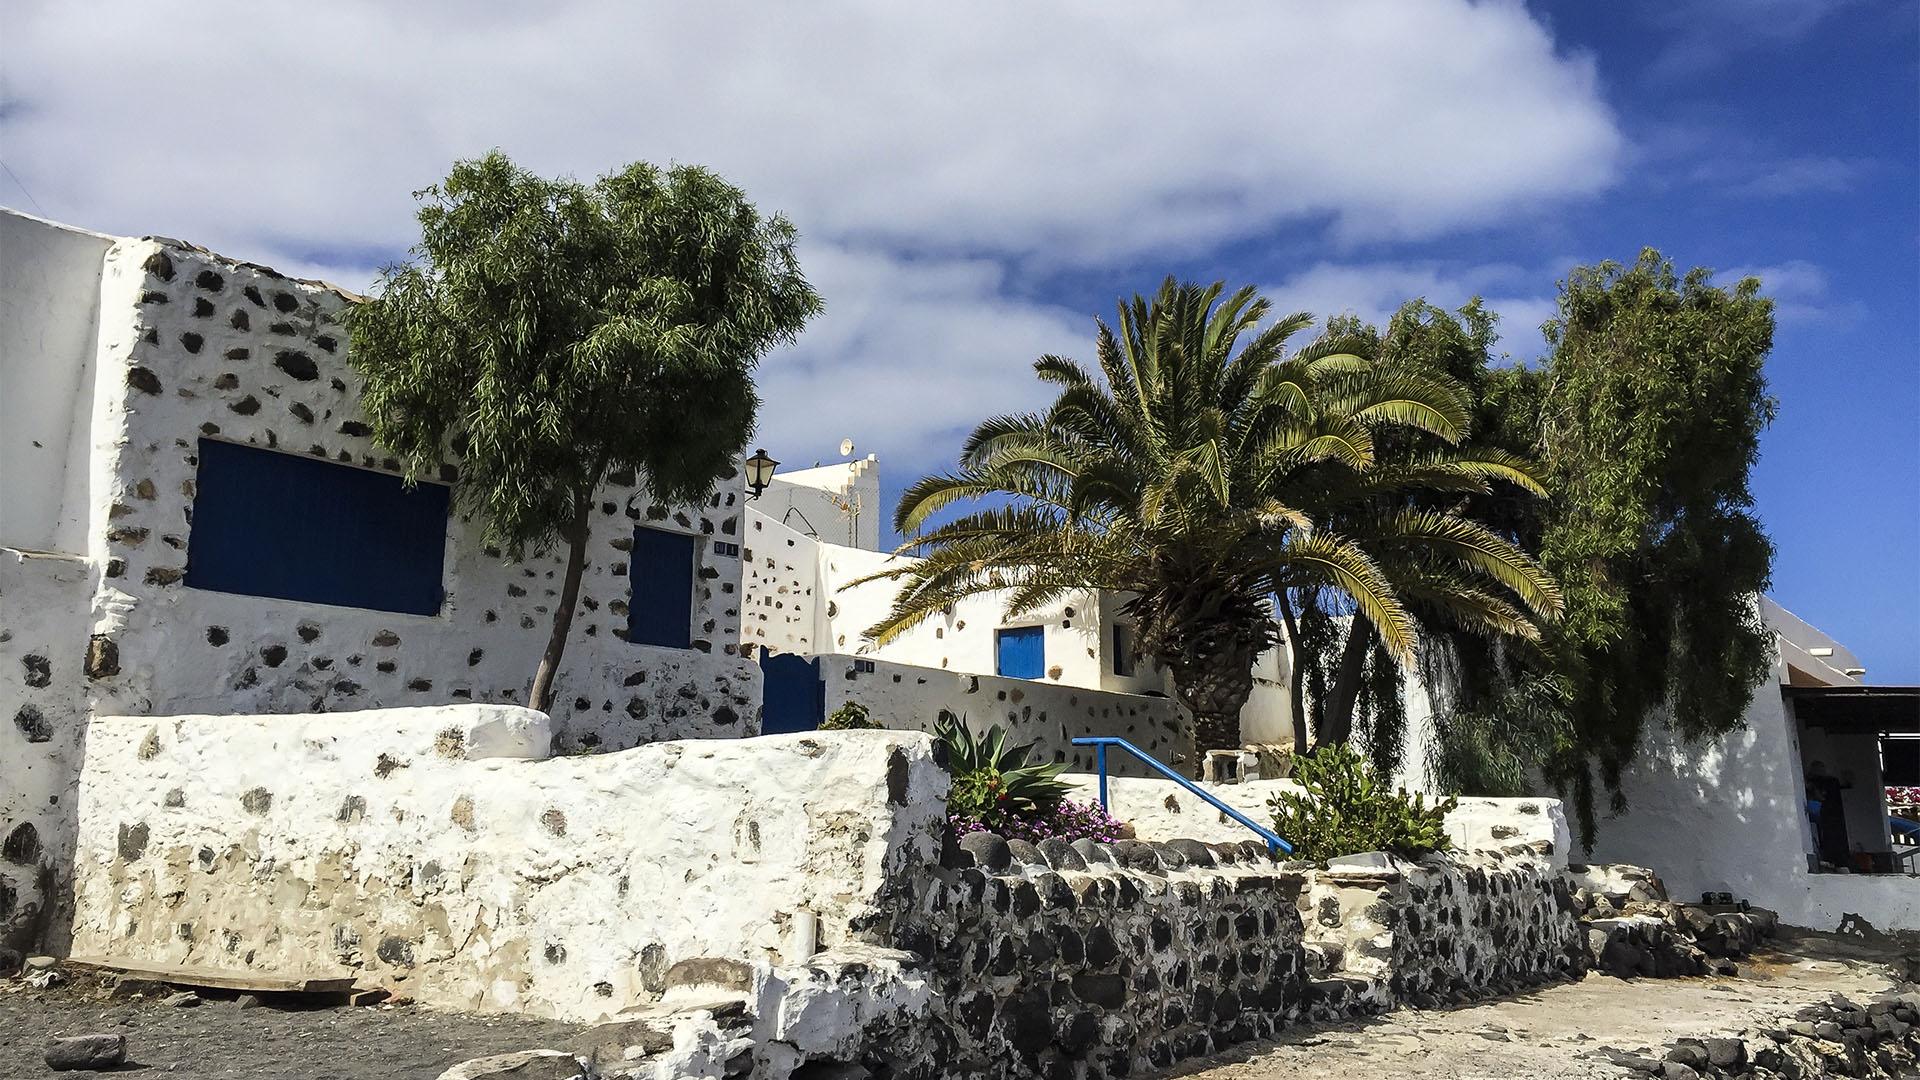 Die Strände Fuerteventuras: Playa de Lajas